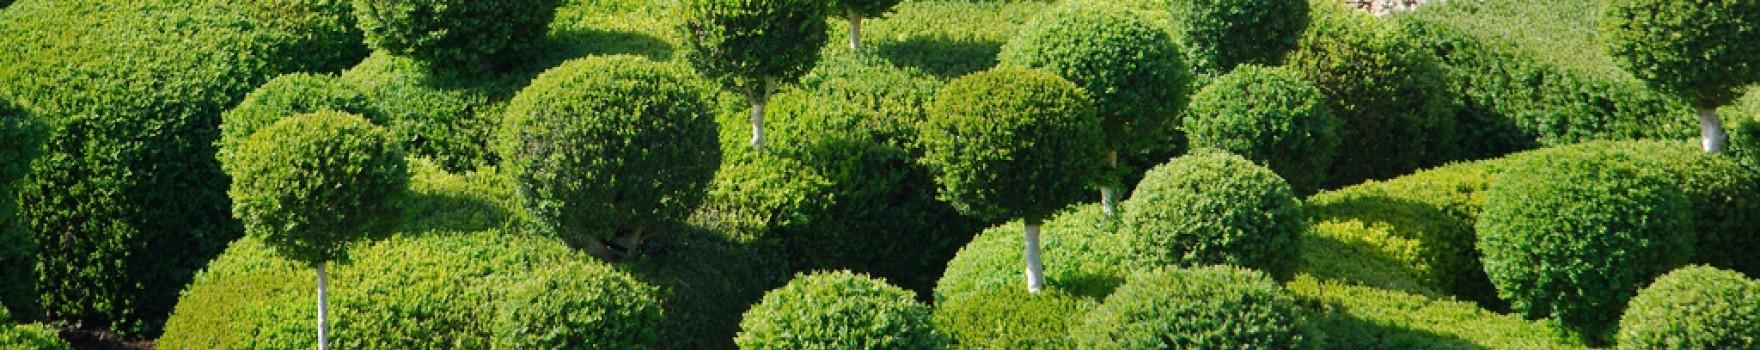 Périgord Noir Parcs et Jardins